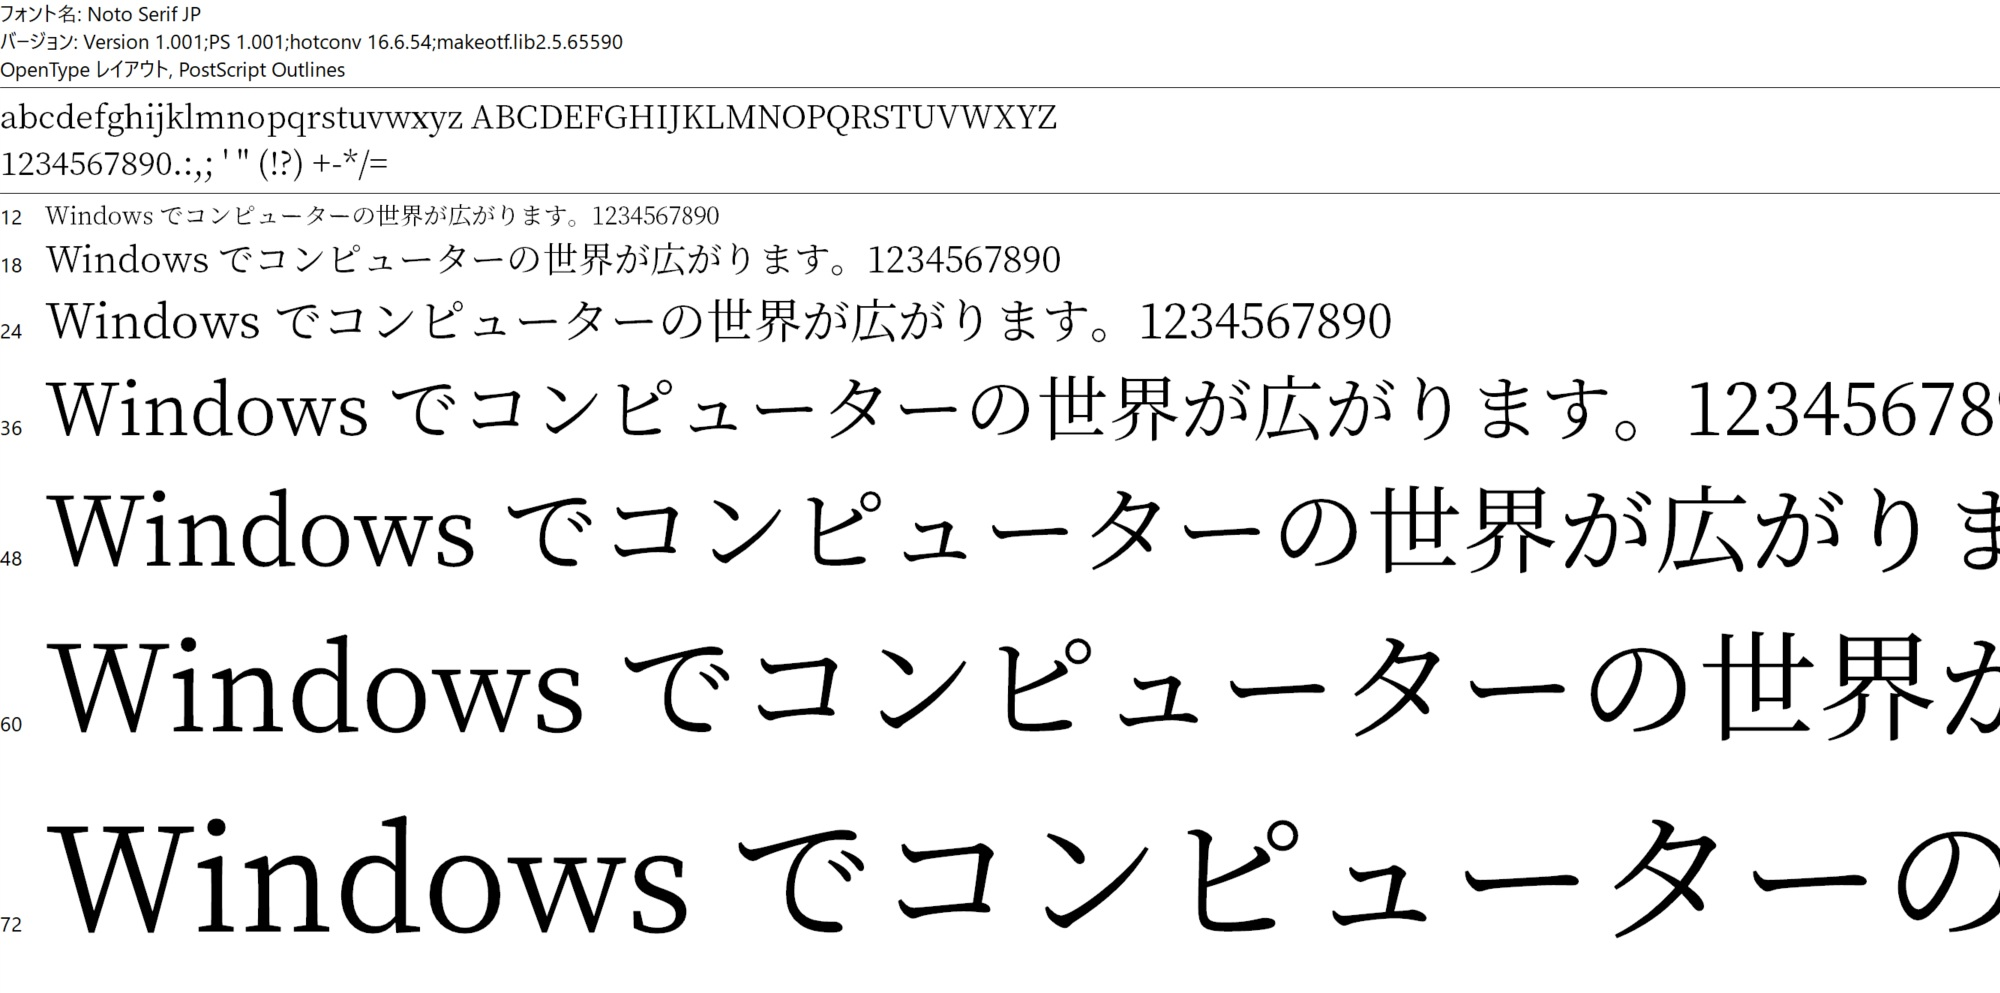 noto selif jp 日本語フォント